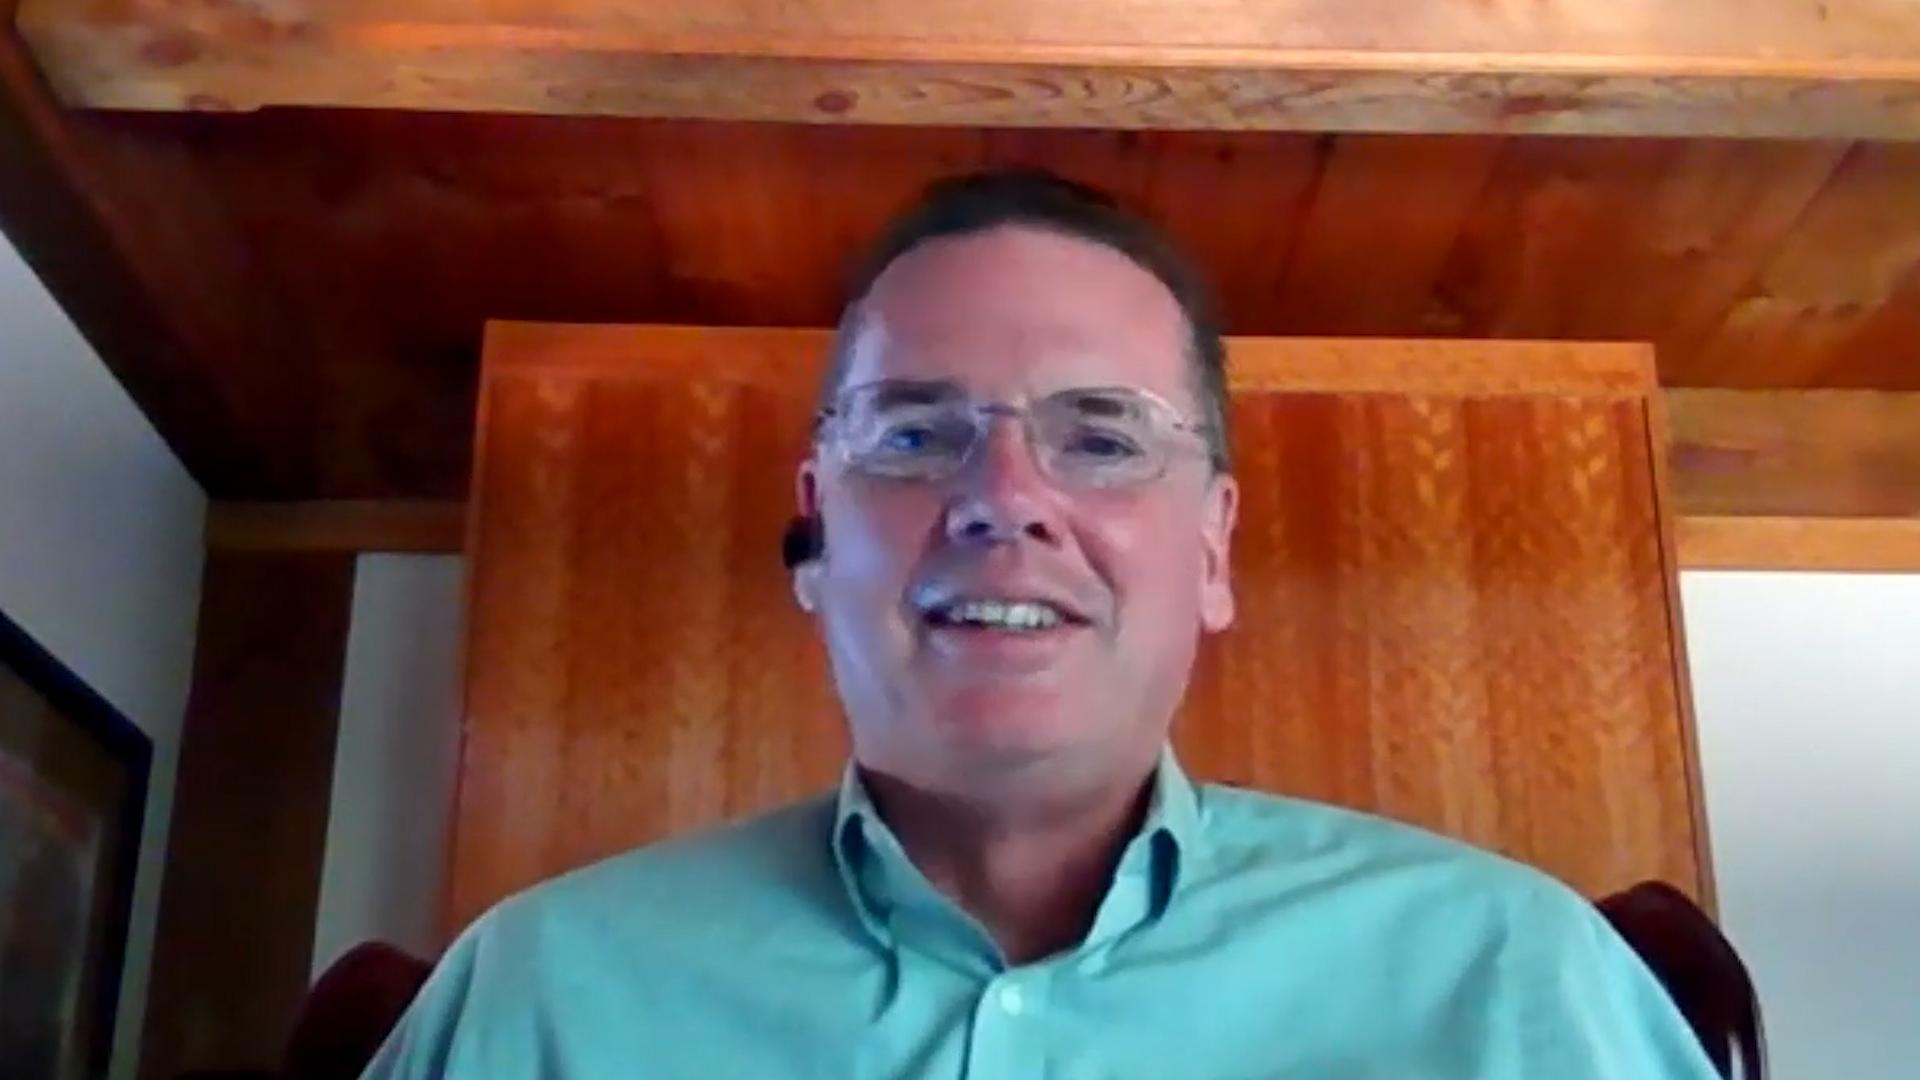 Video preview: Scott Schinlever Returns to EFI